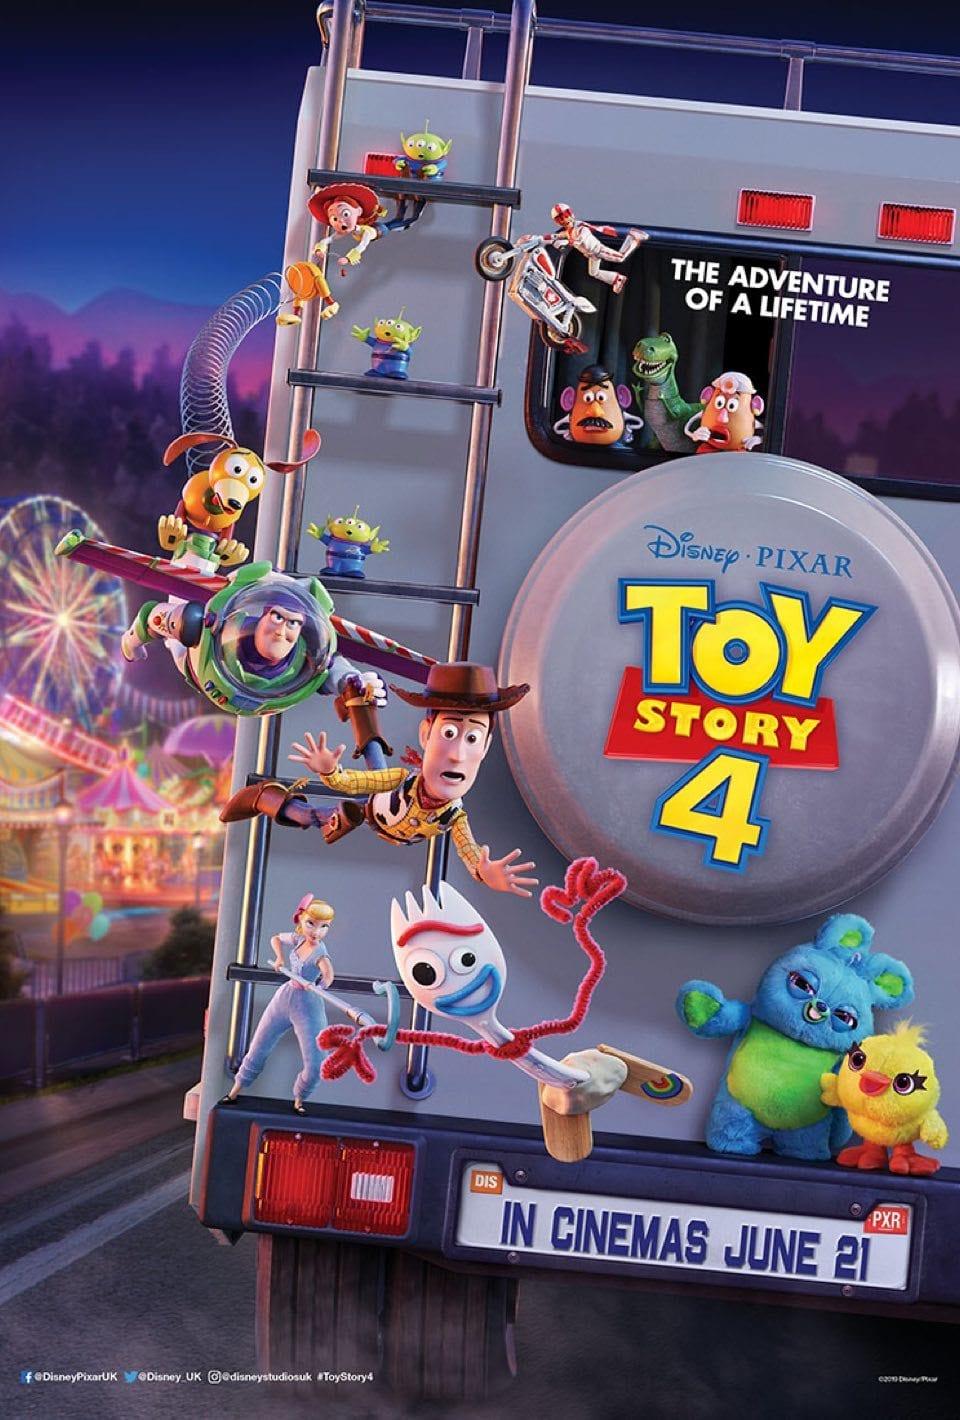 uk_toy-story-4_intl-payoff-rv-poster_r_b6aec6cf.jpg